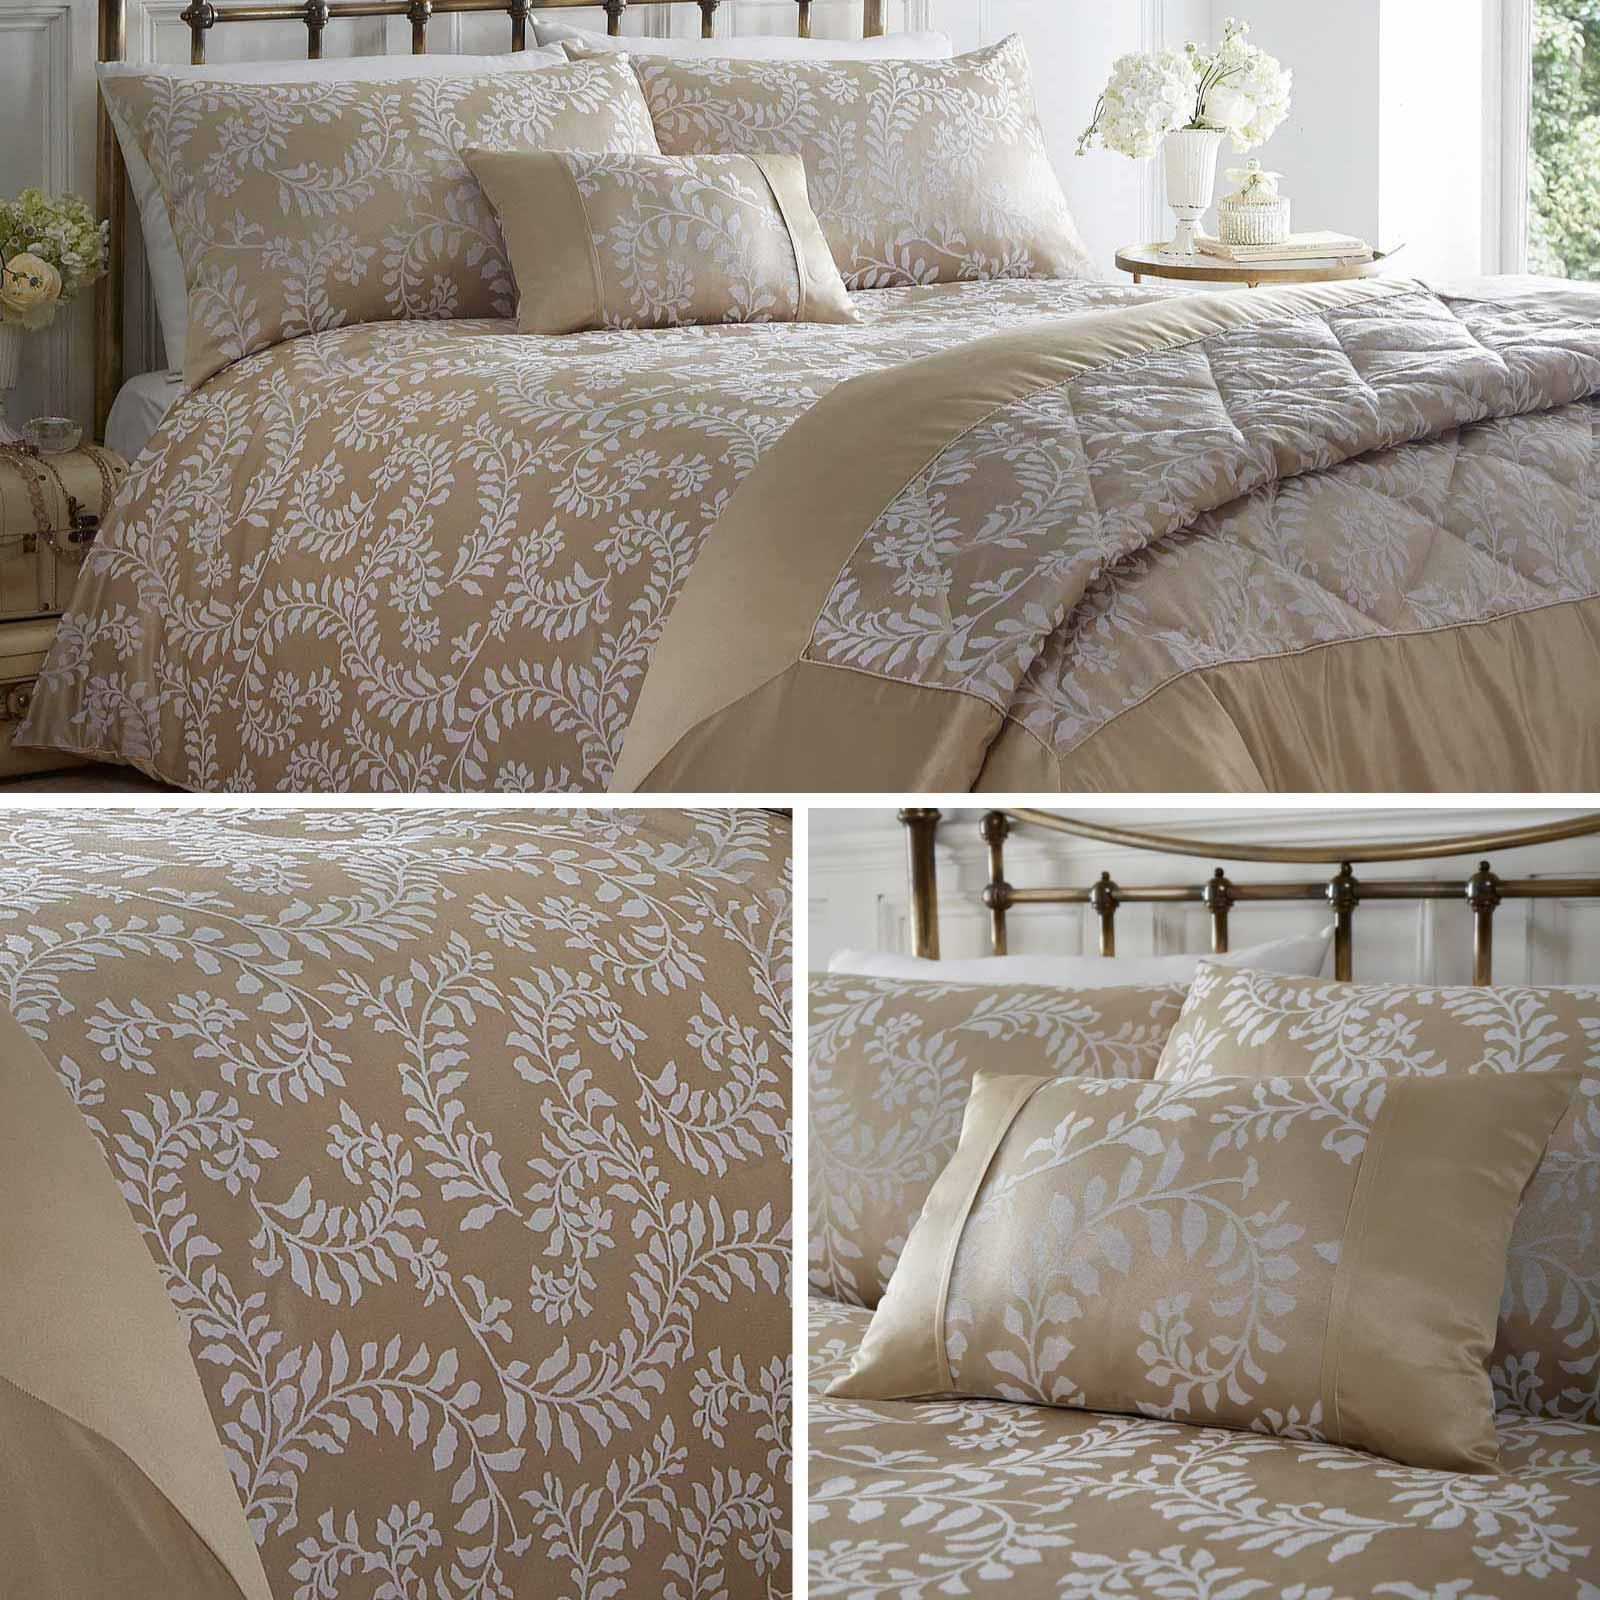 Classic Denim Check Duvet Sets Quilt Cover Bedding Set And Pillow Cases